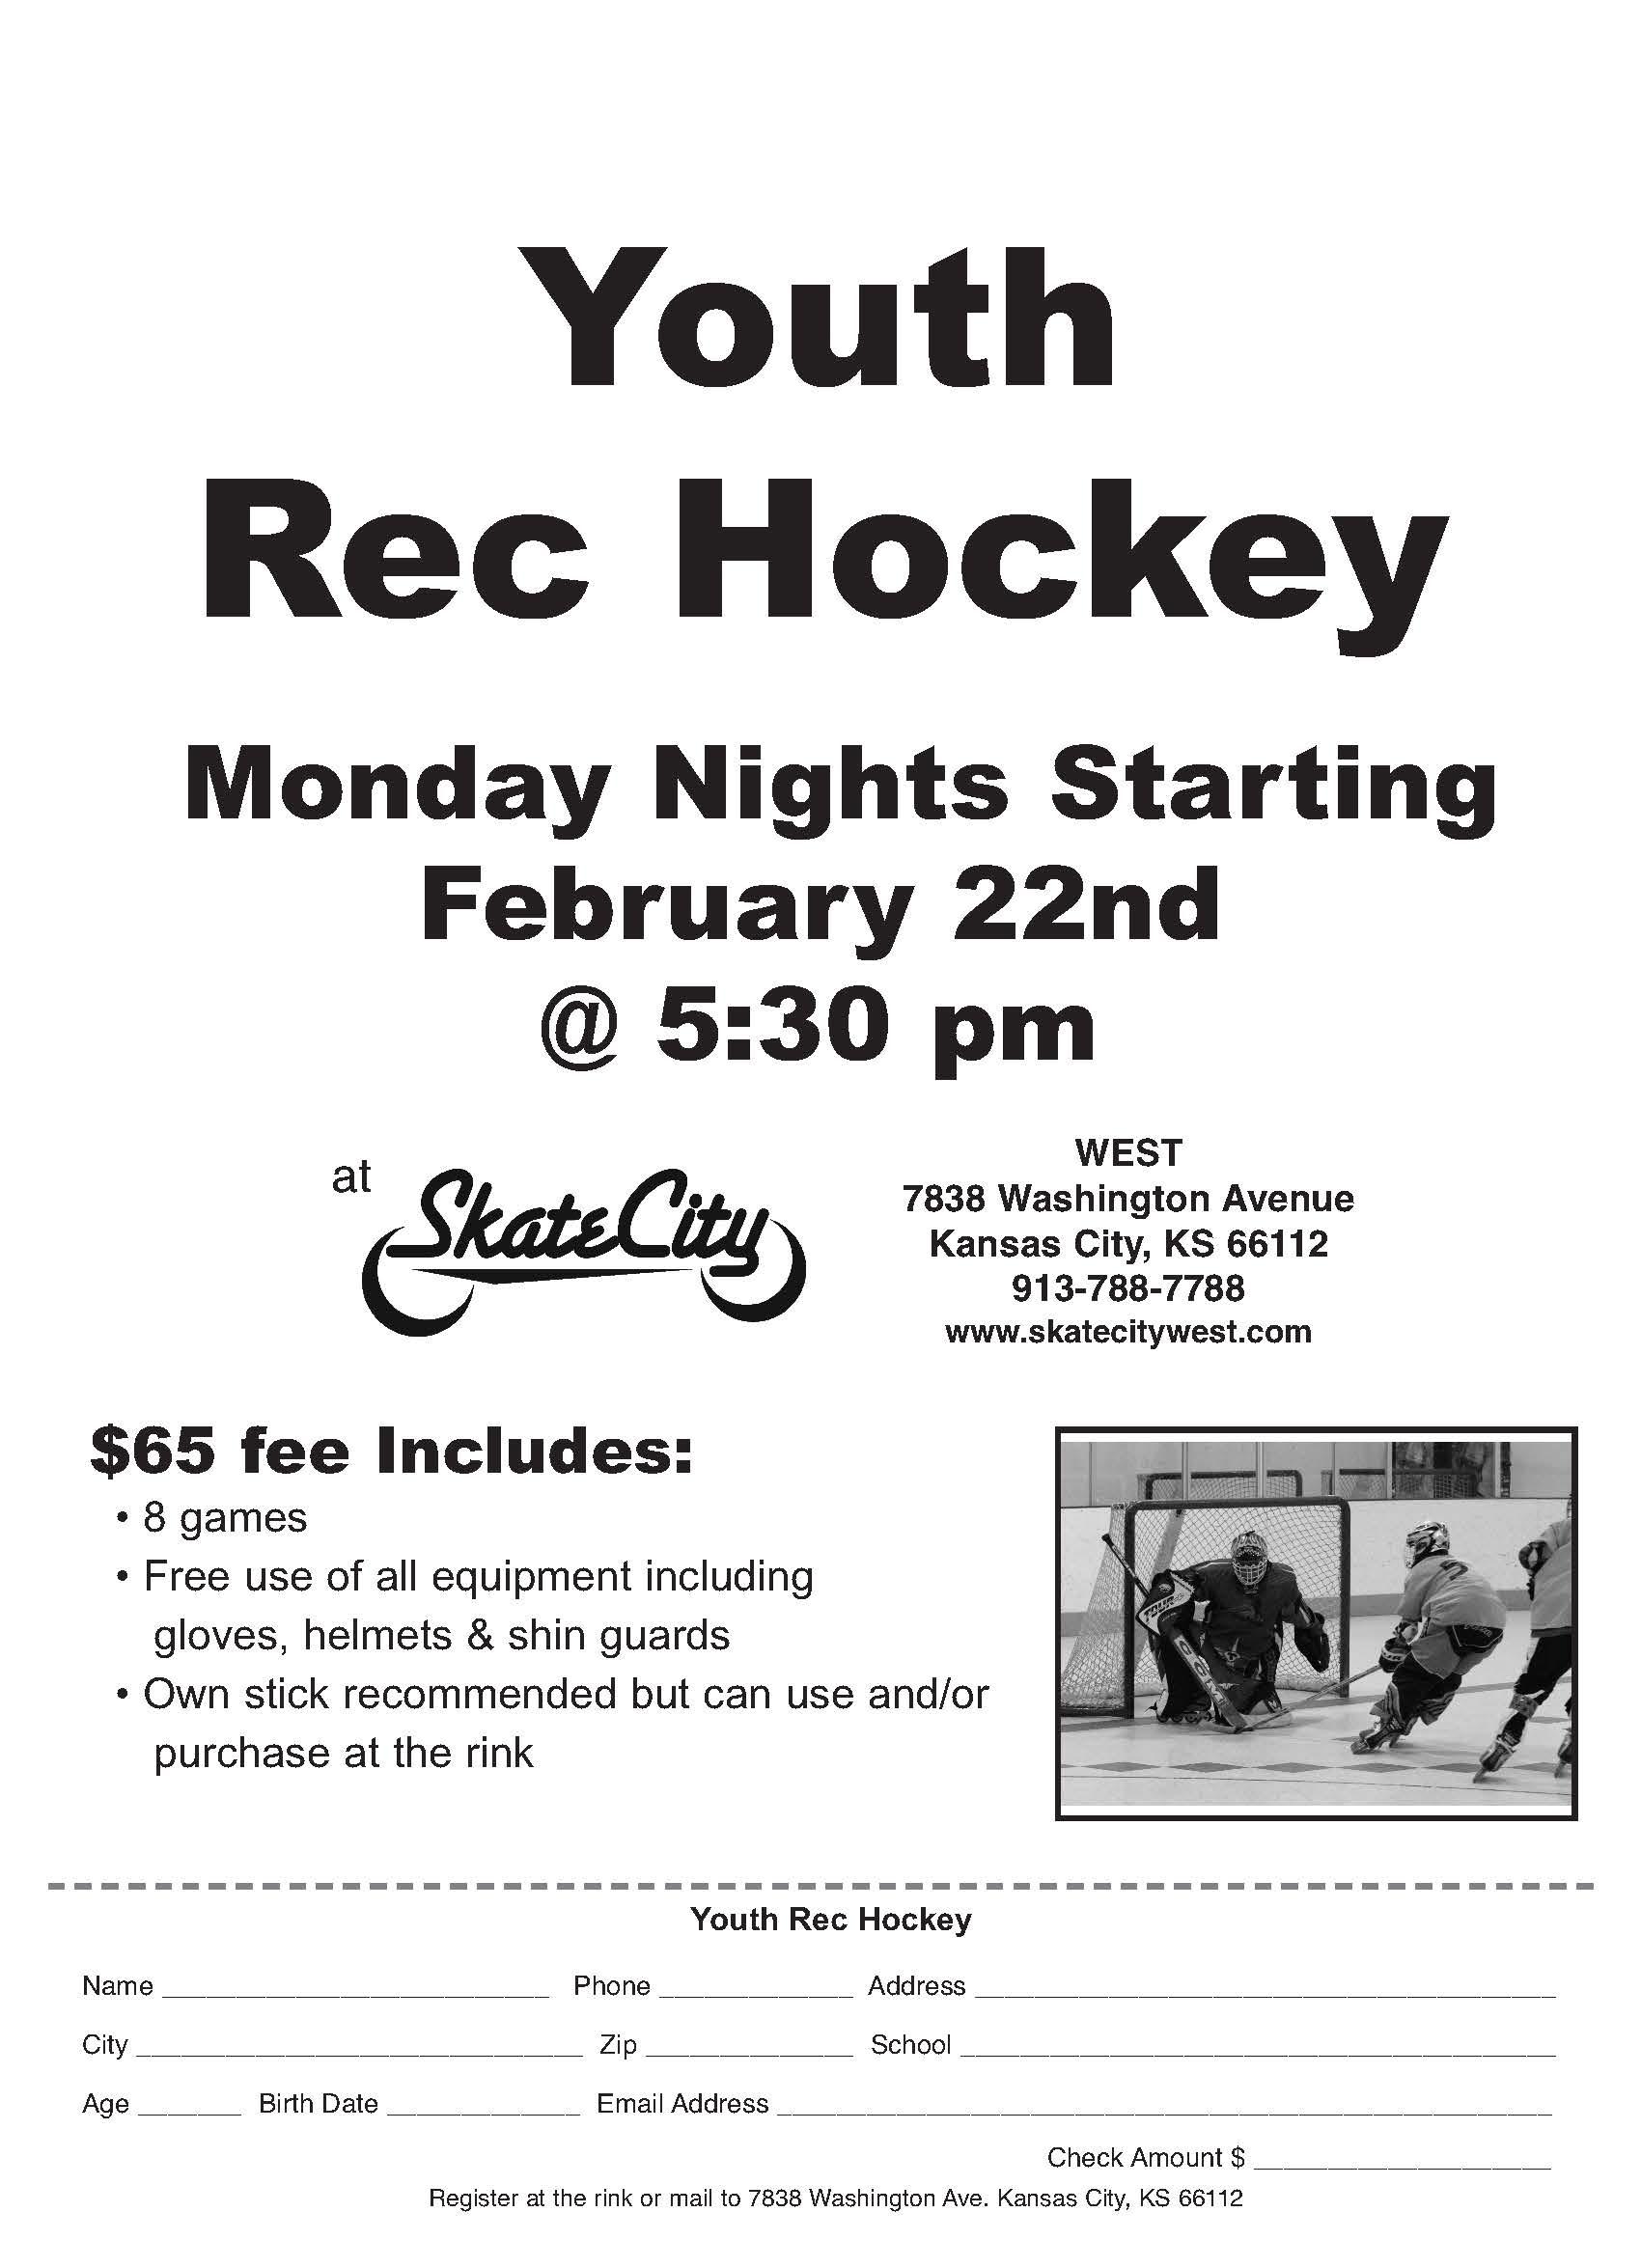 Youth Rec Hockey Feb 2021